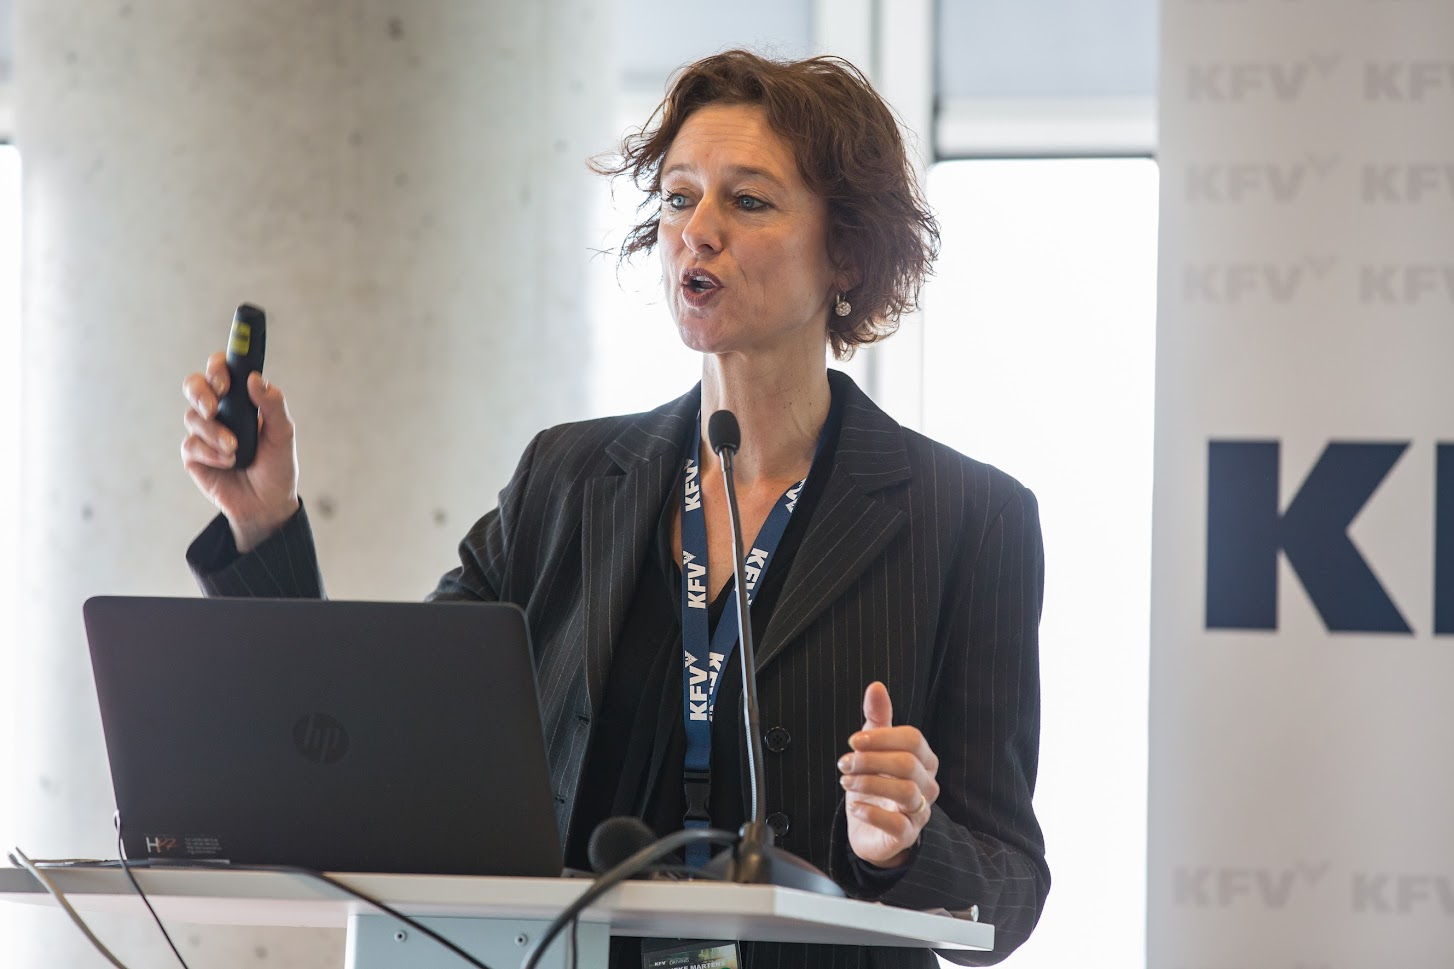 Prof. Dr. Marieke Martens © KFV/APA